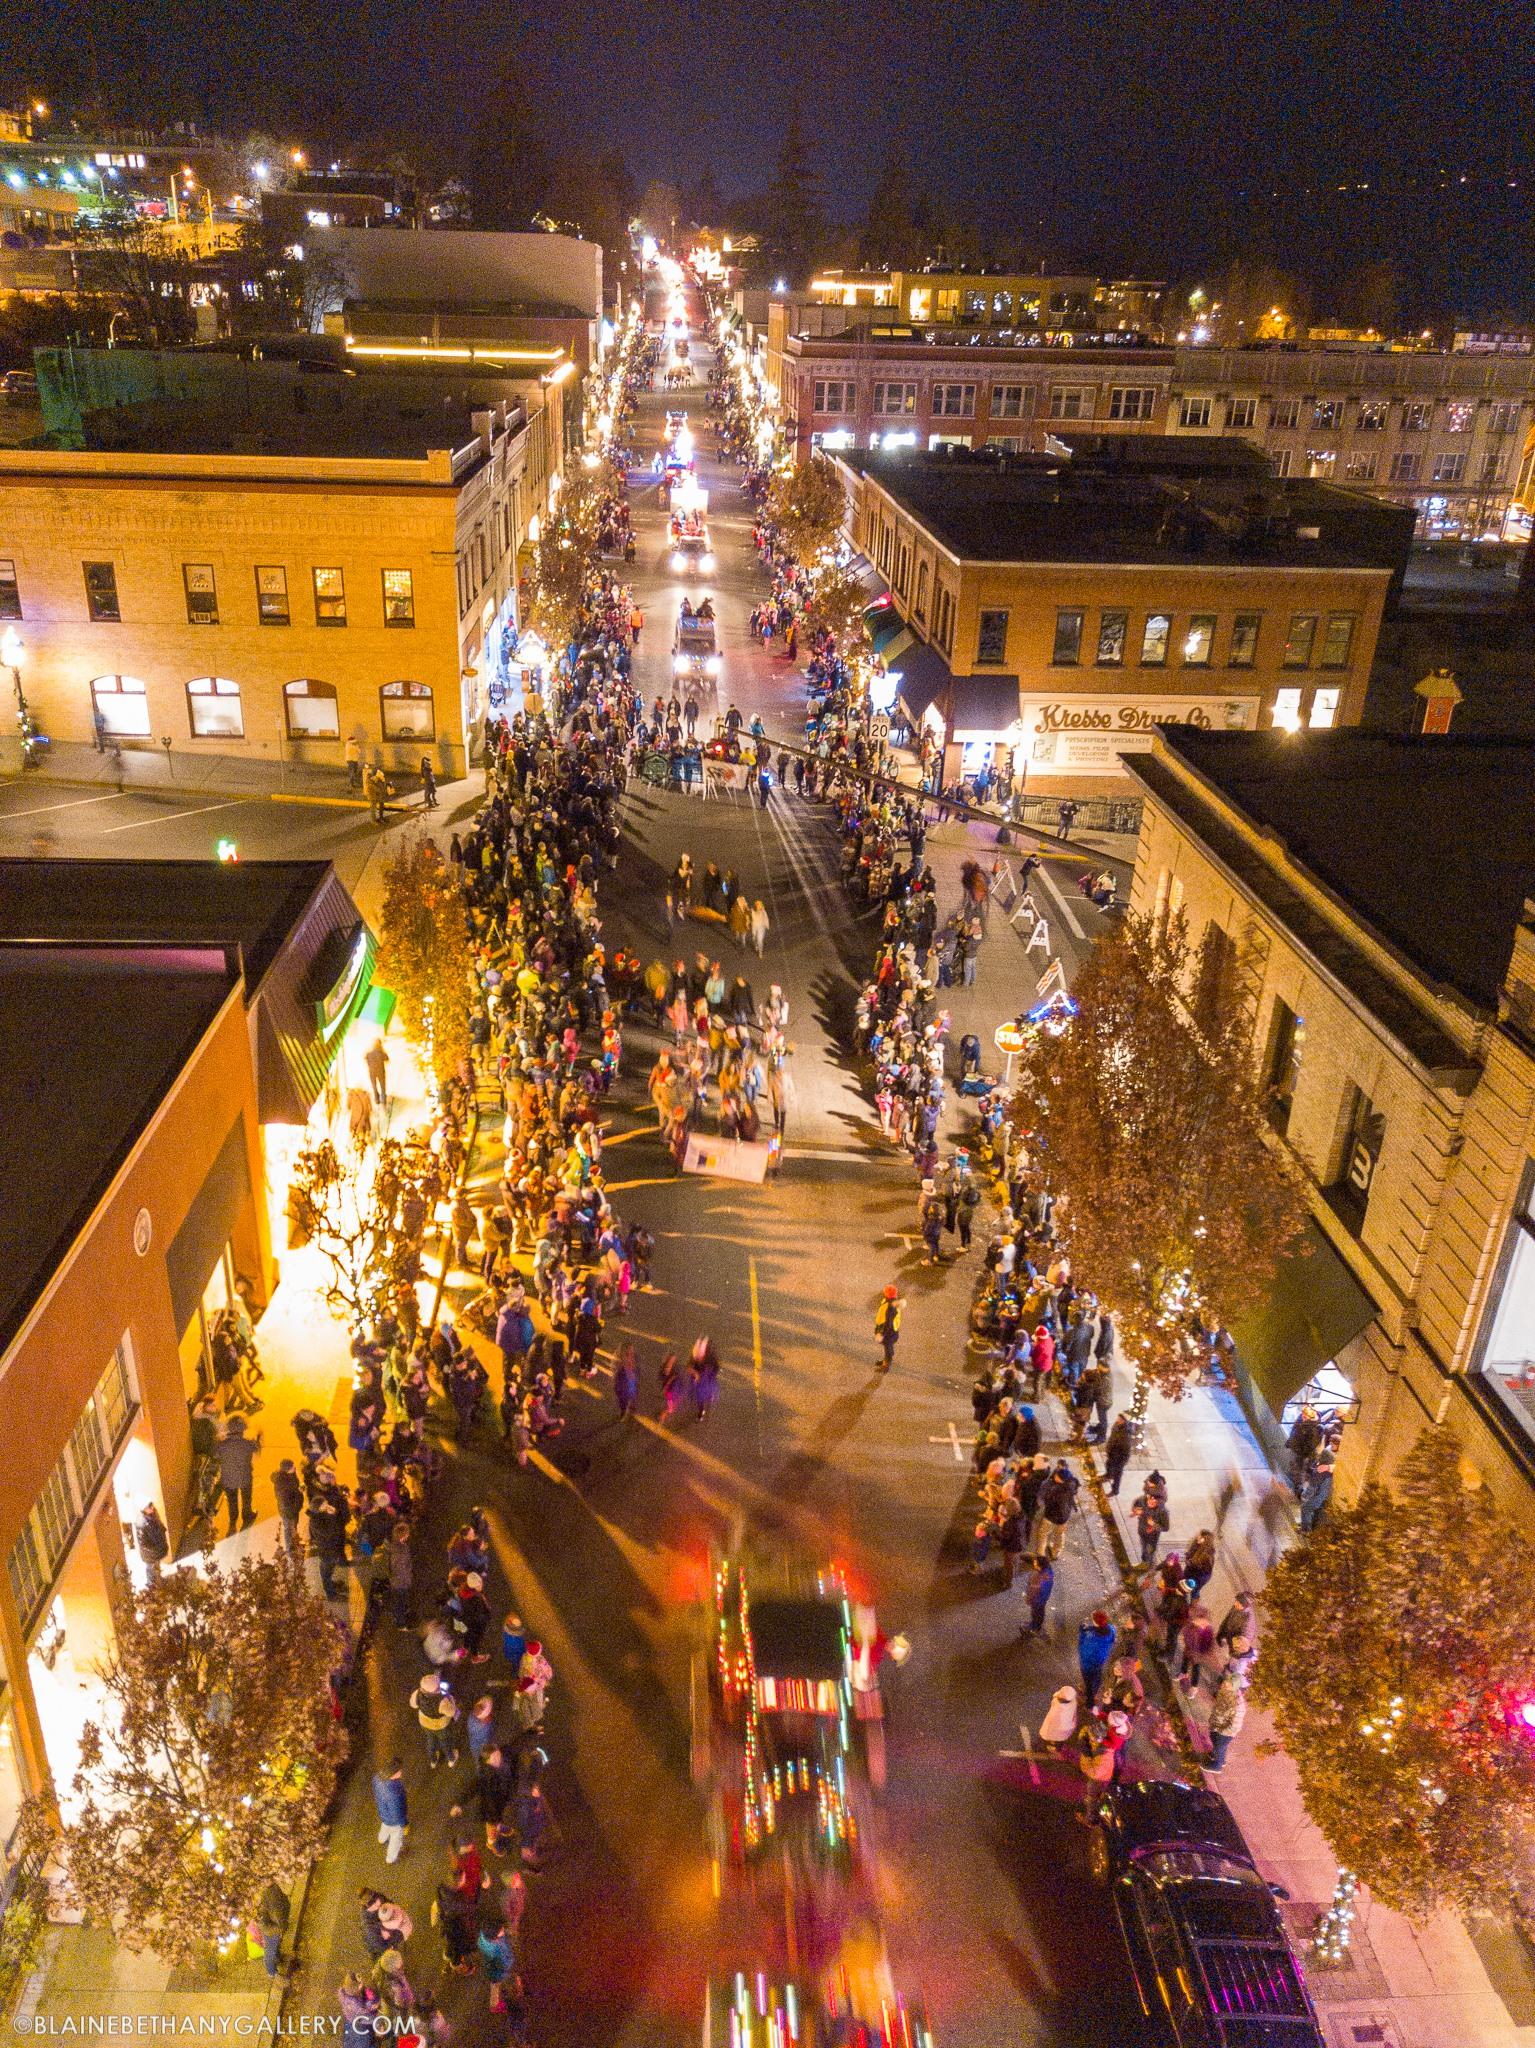 The 2018 Hood River Holiday parade. Photo: (c) Blane Franger, BeautifulHoodRiver.com